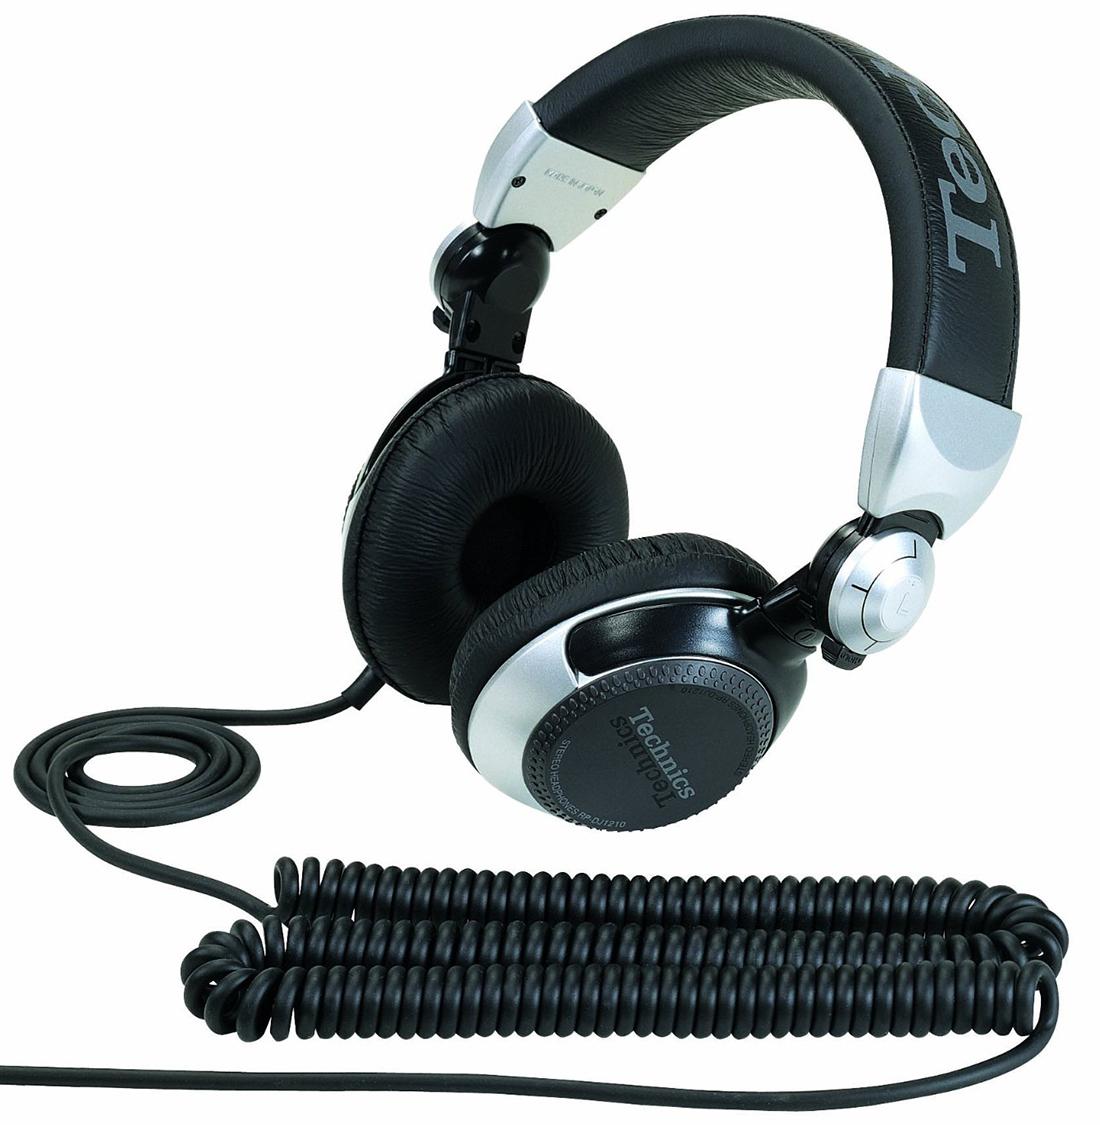 Technics RP-DJ1210E-S - мониторные наушники (Black/Silver)